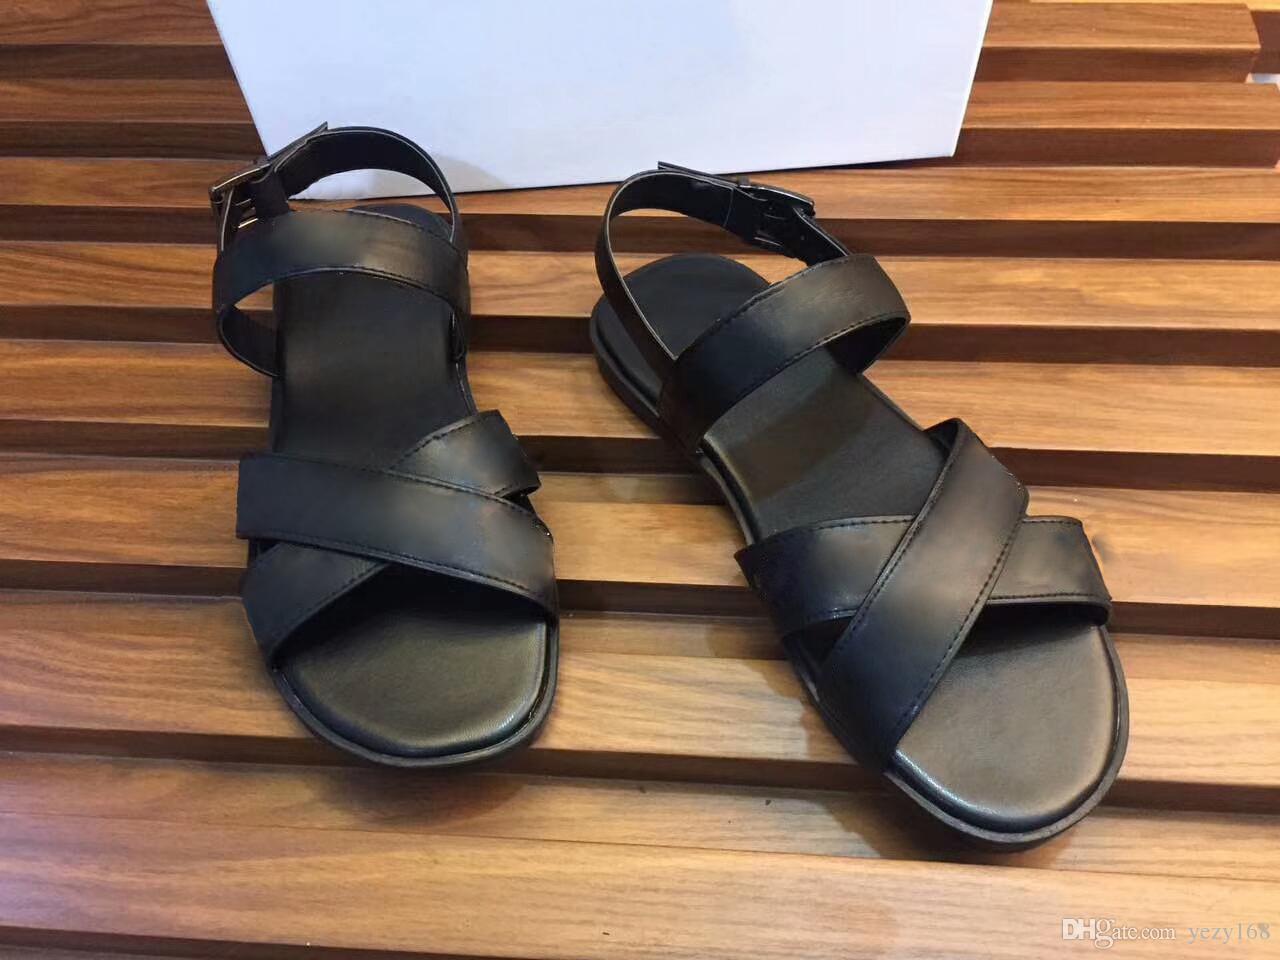 d0b0b3ac8fd Cheap Shoes Sandals Slippers Flip Flops Best Summer Leather Soled Sandals  Women